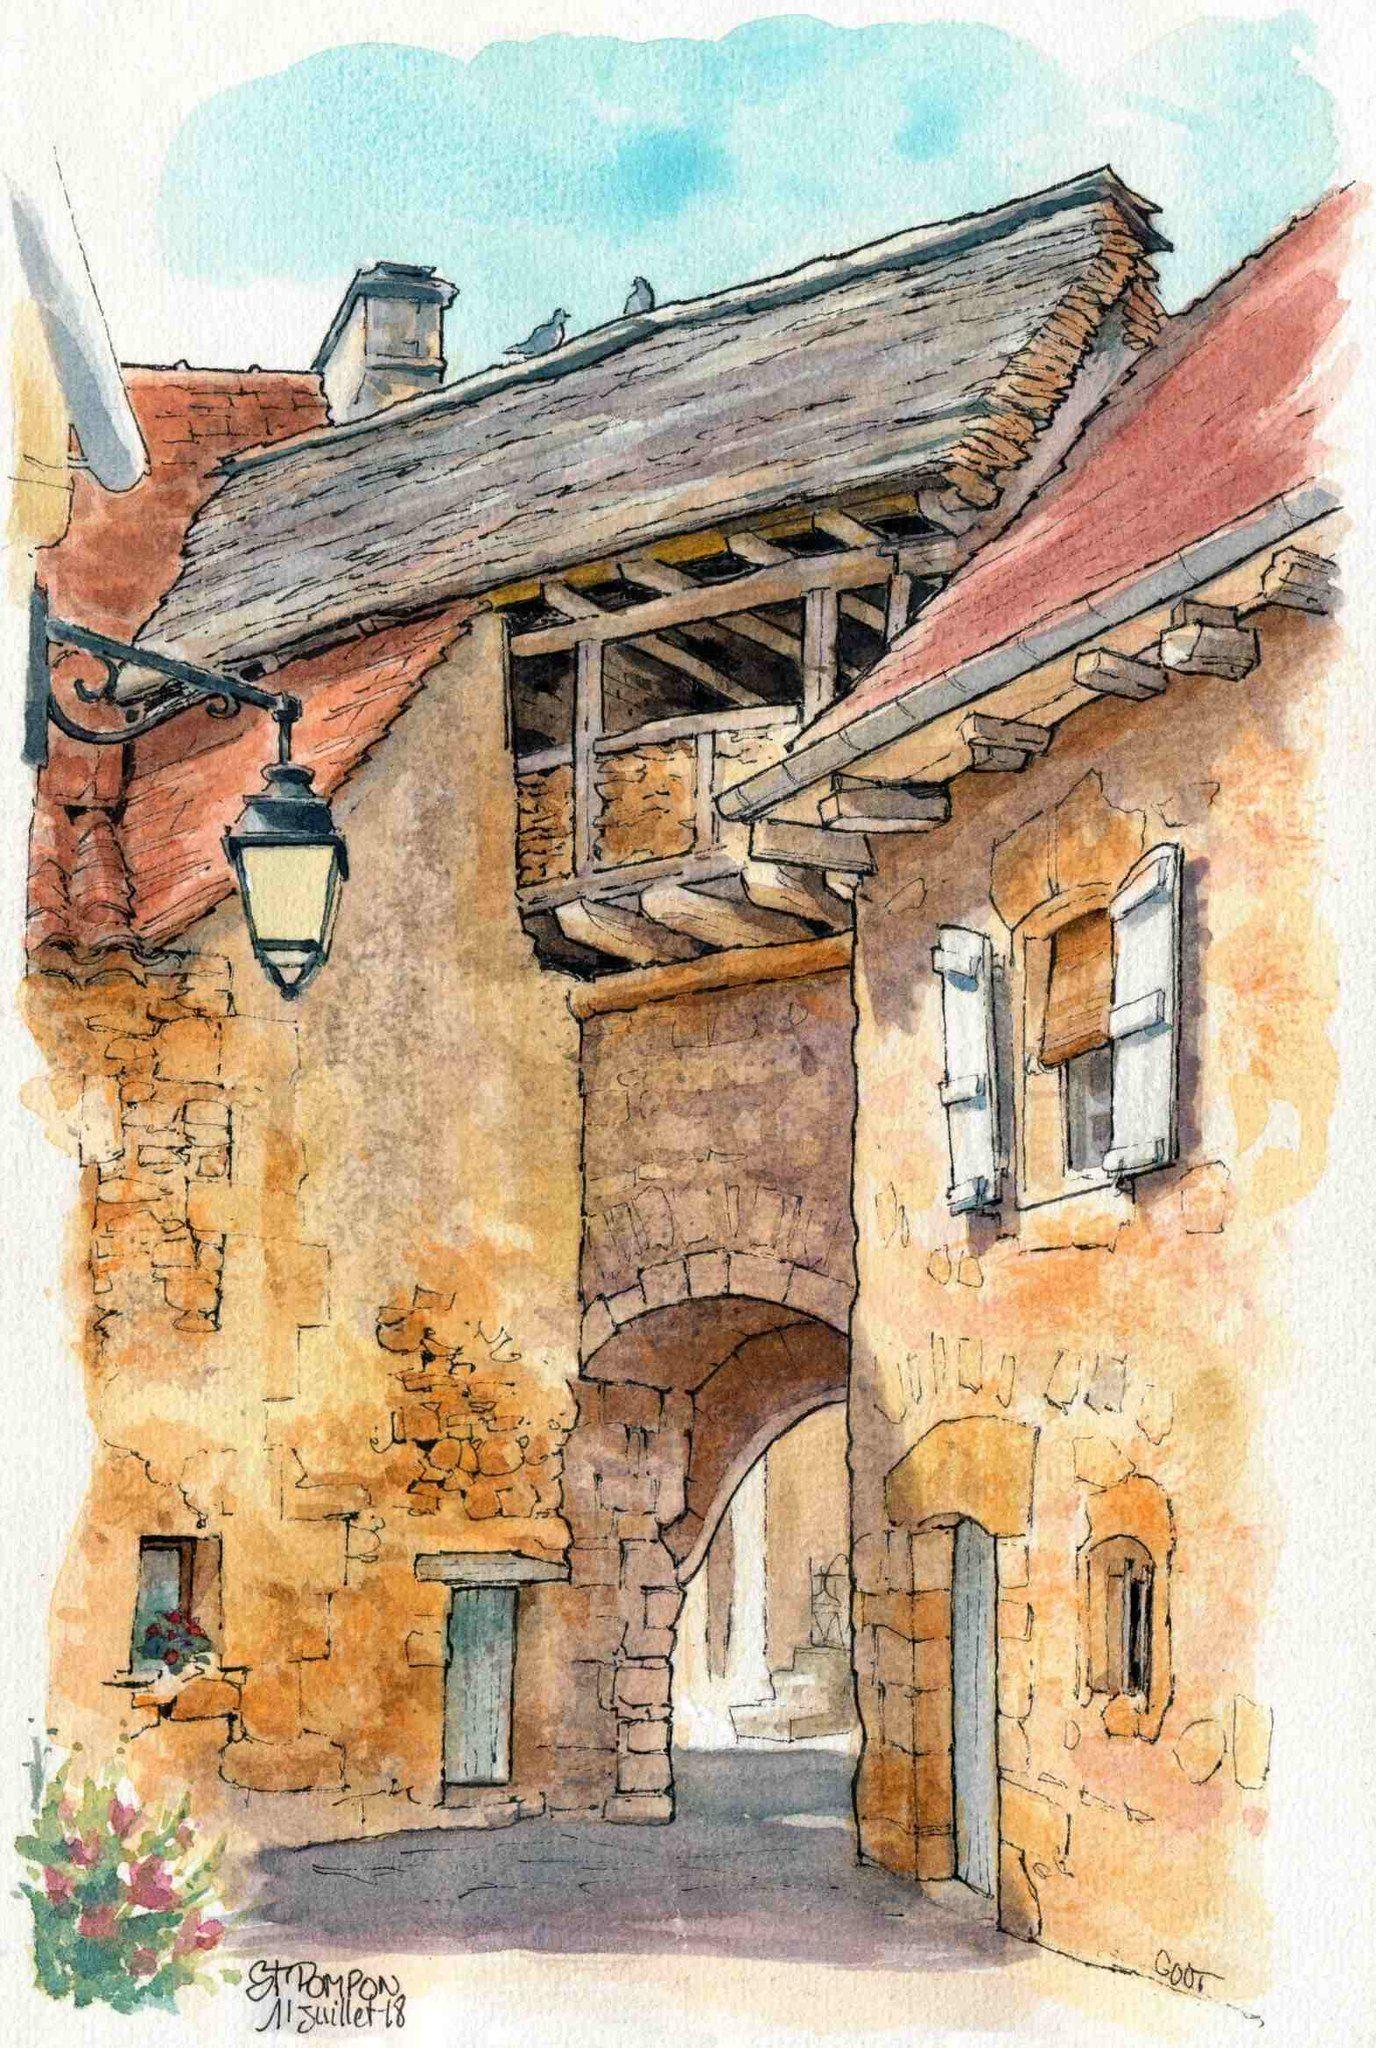 St Pompon Vestige Rempart In 2020 Watercolor Architecture